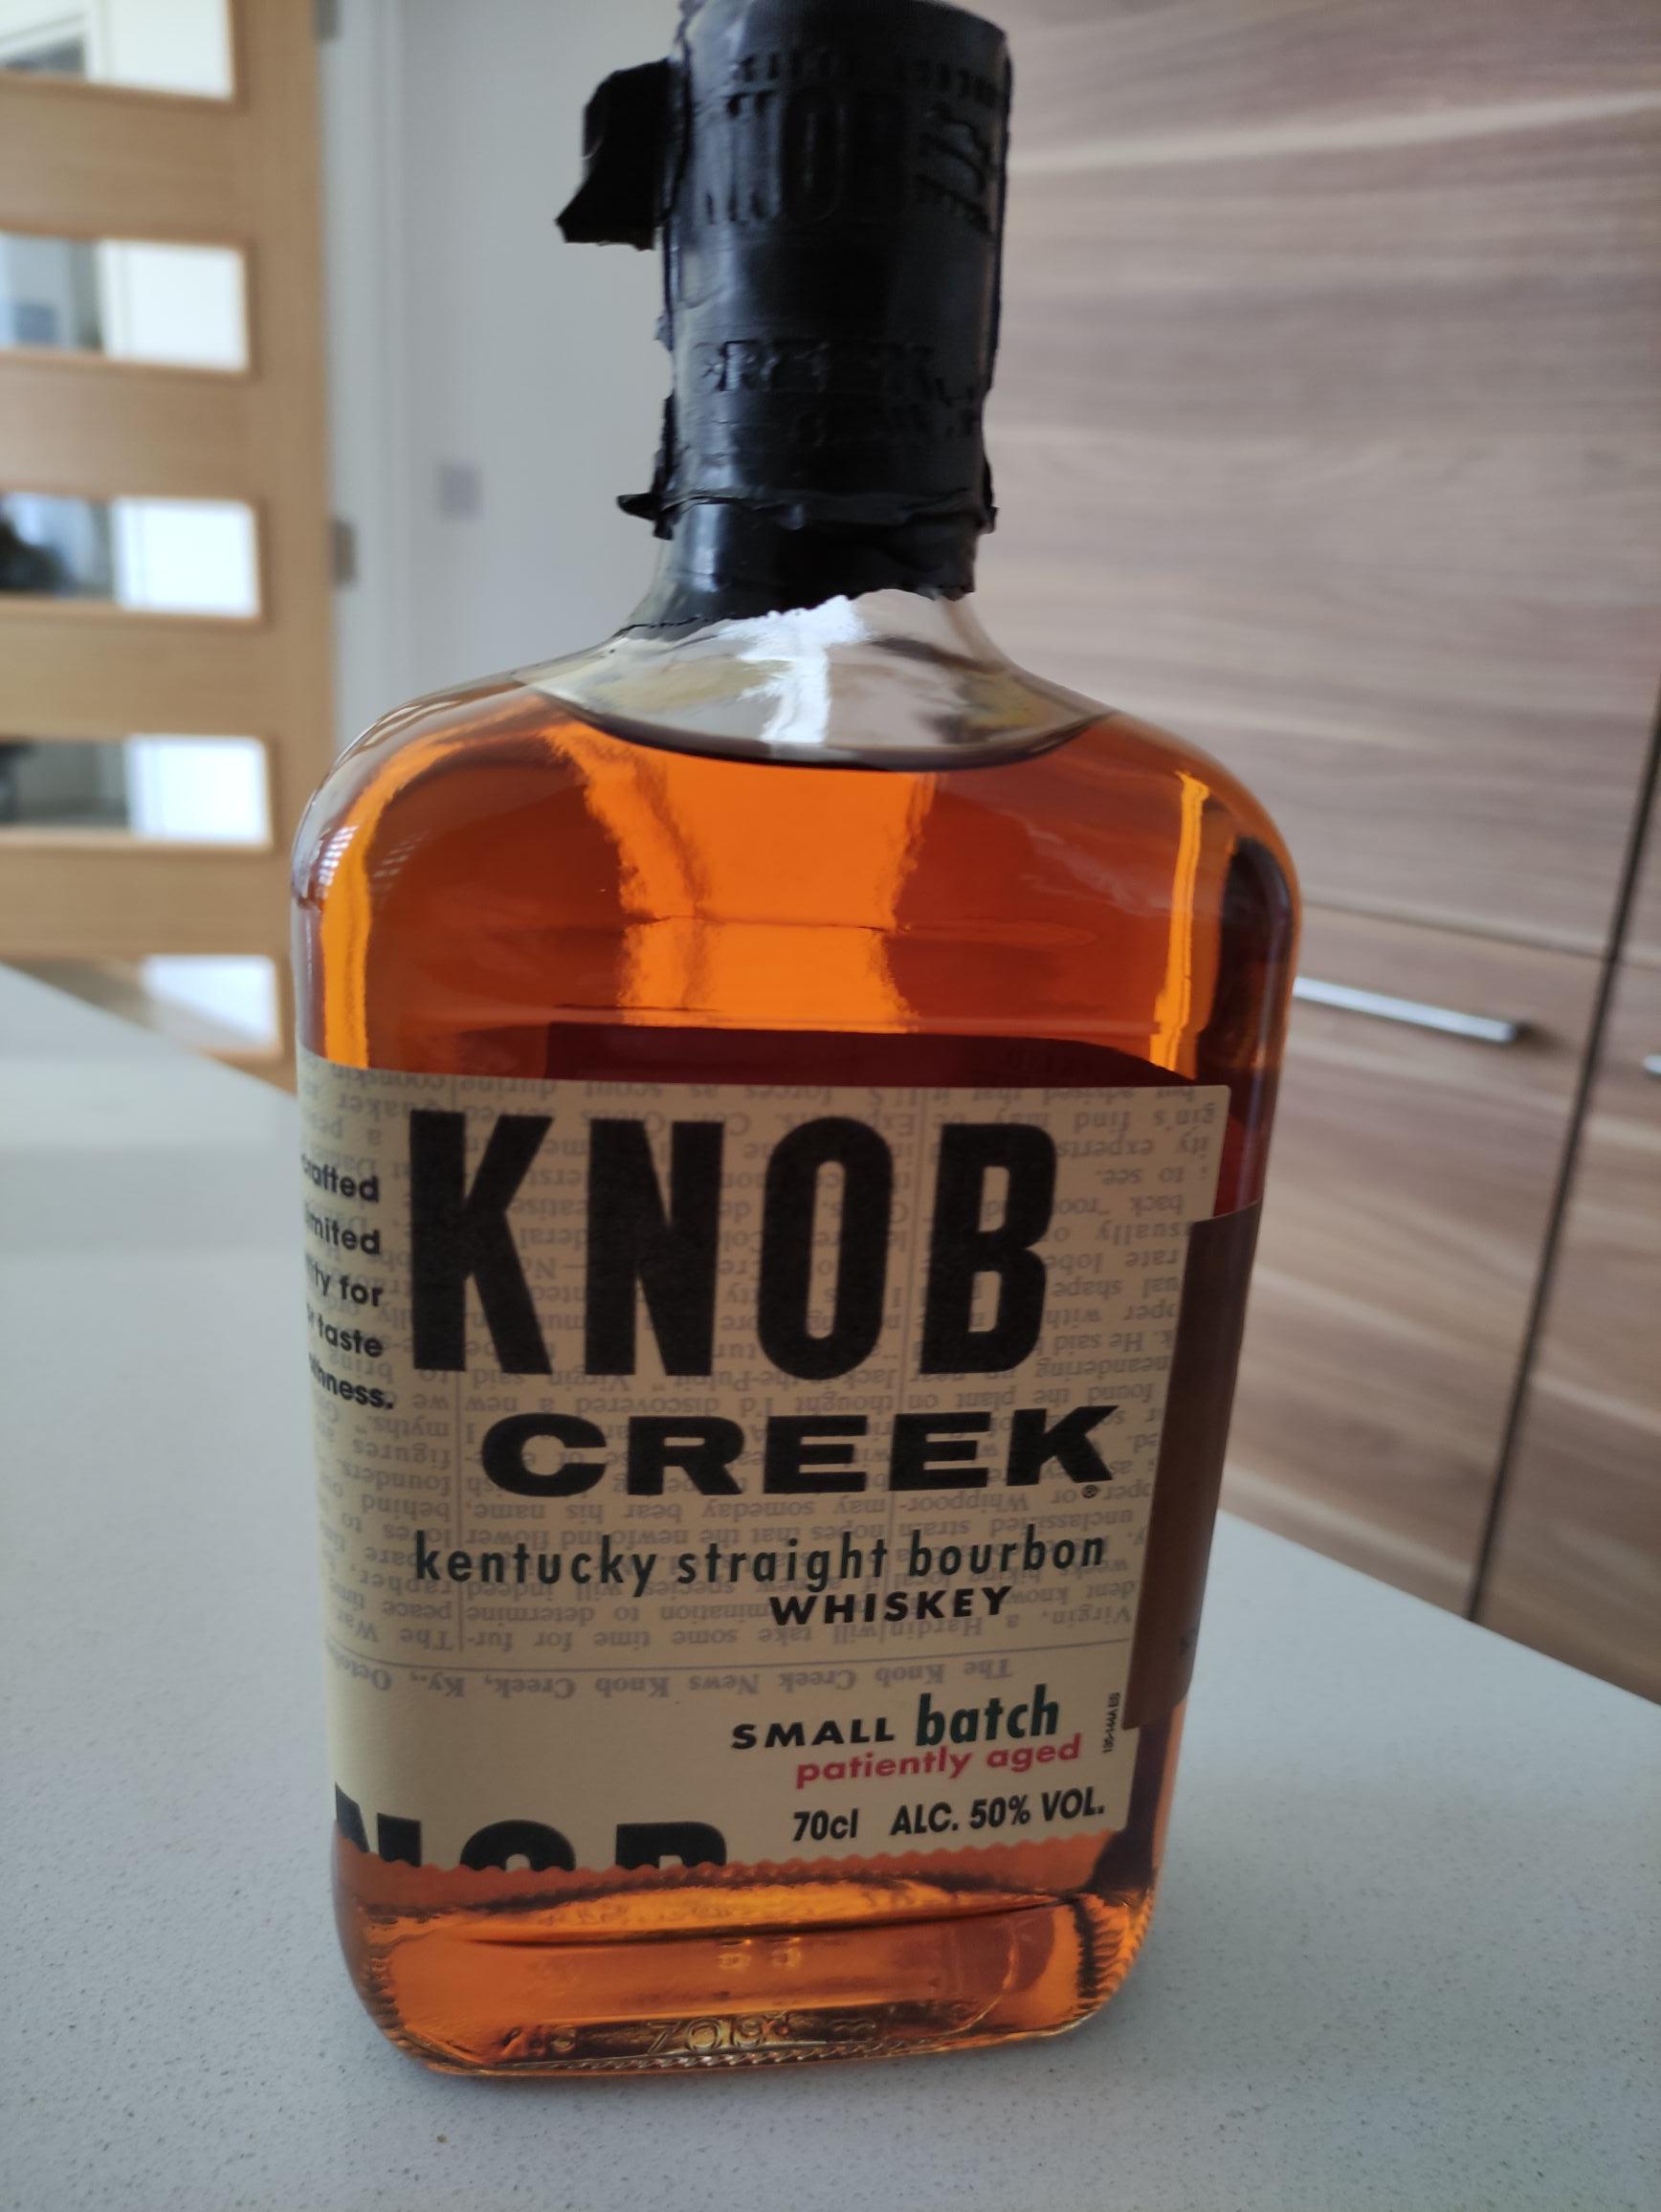 Knob Creek Straight Bourbon Whiskey £17.50 at Asda Dyce, Aberdeen